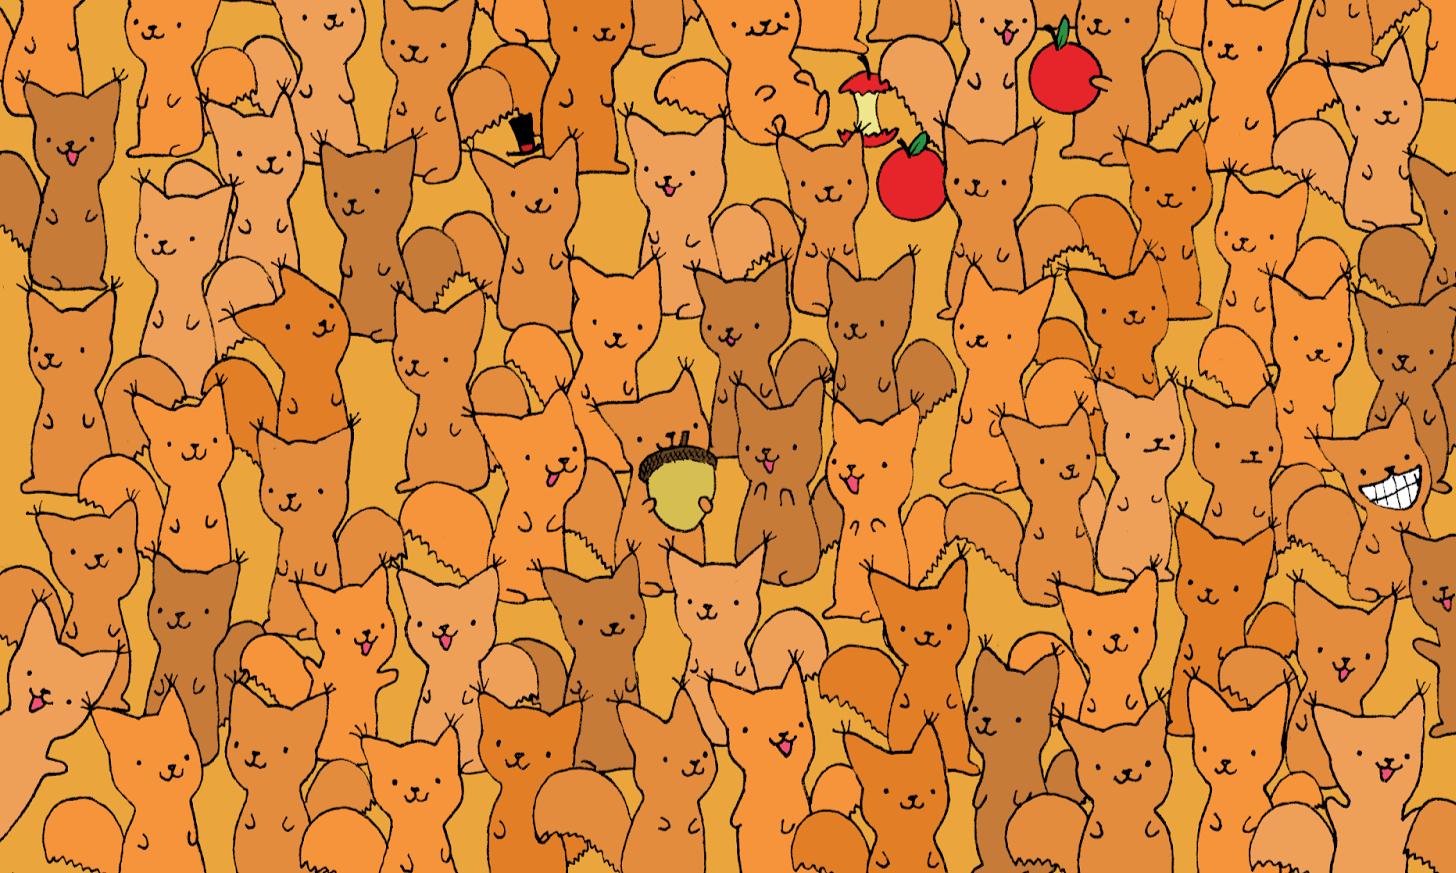 картинка найди медведя среди собак был хороший салон